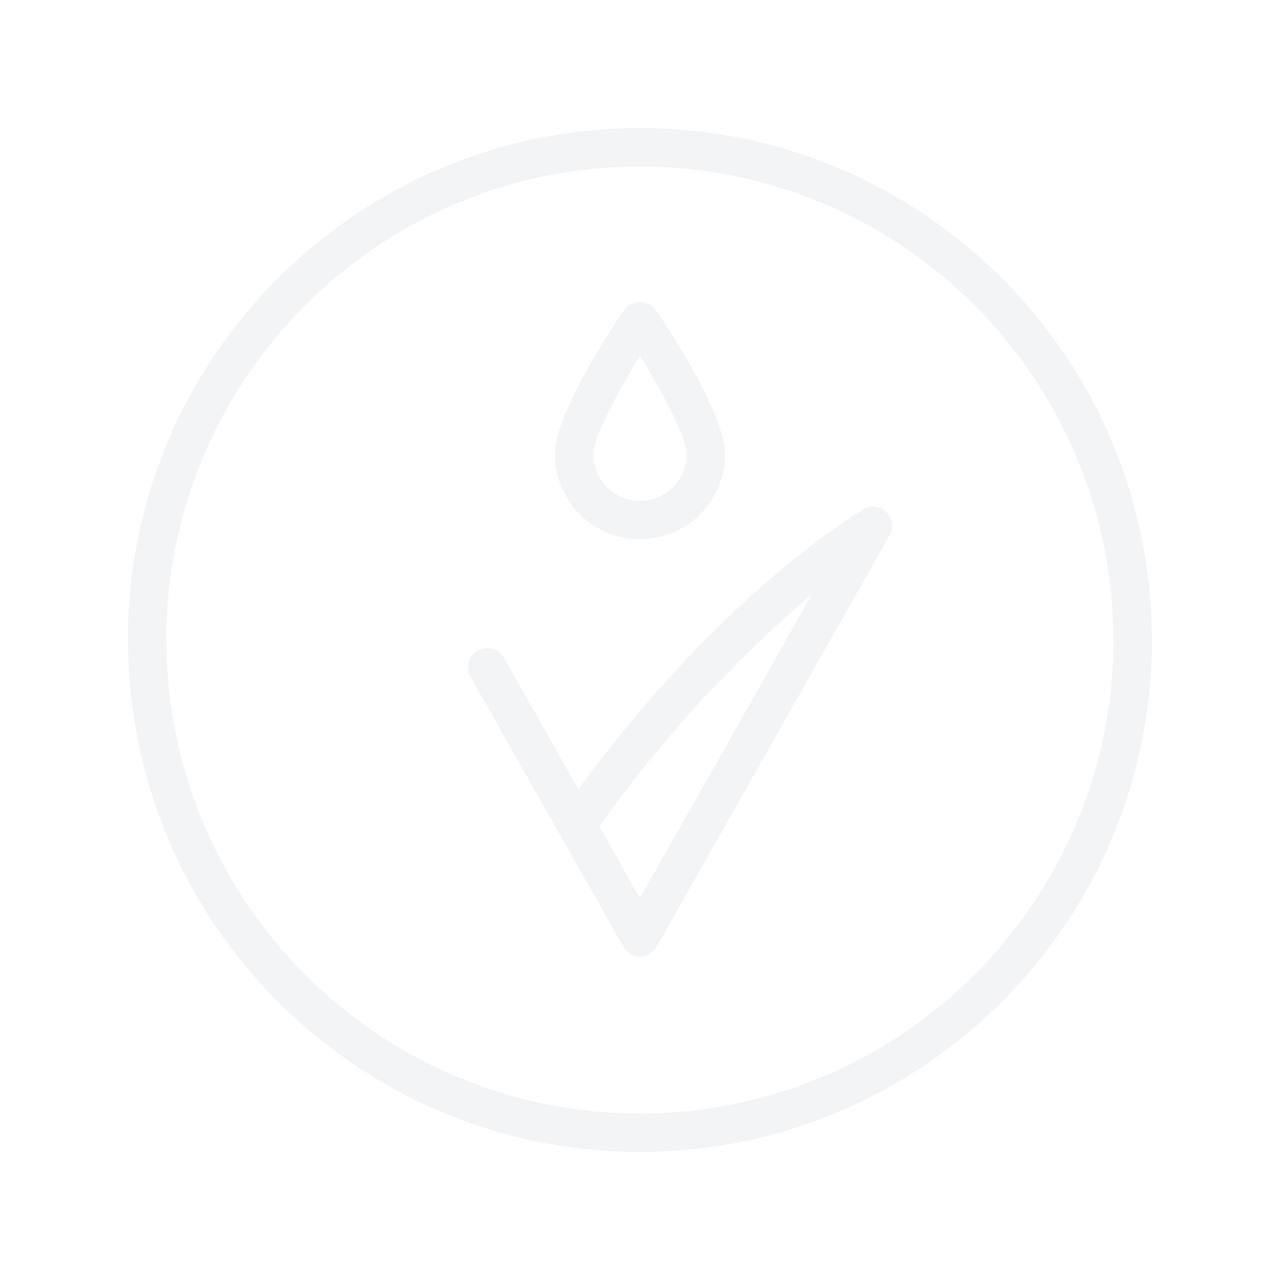 NATURA SIBERICA Taiga Daily Protection Hand Cream 30ml